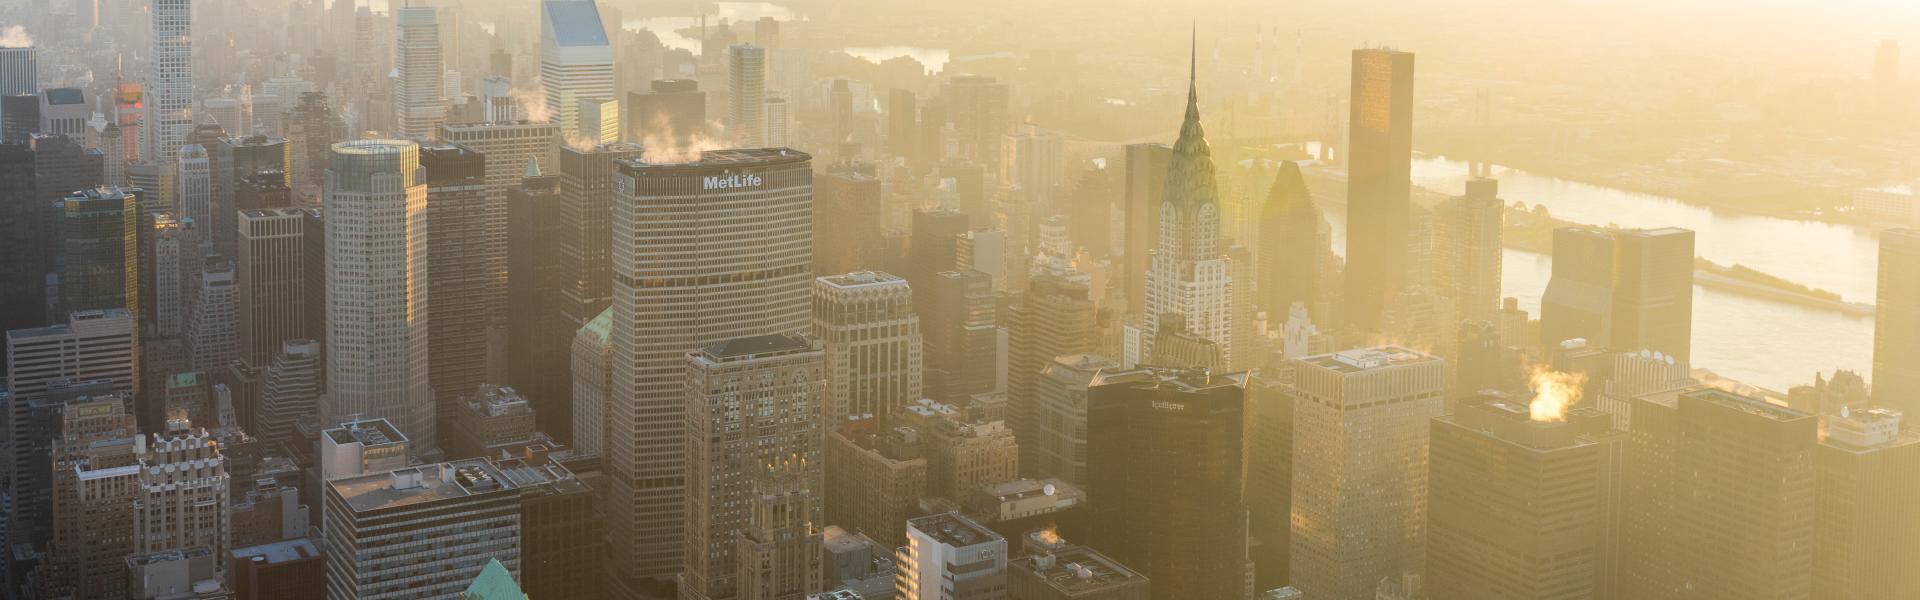 Skyline, Empire State Building, Sunrise